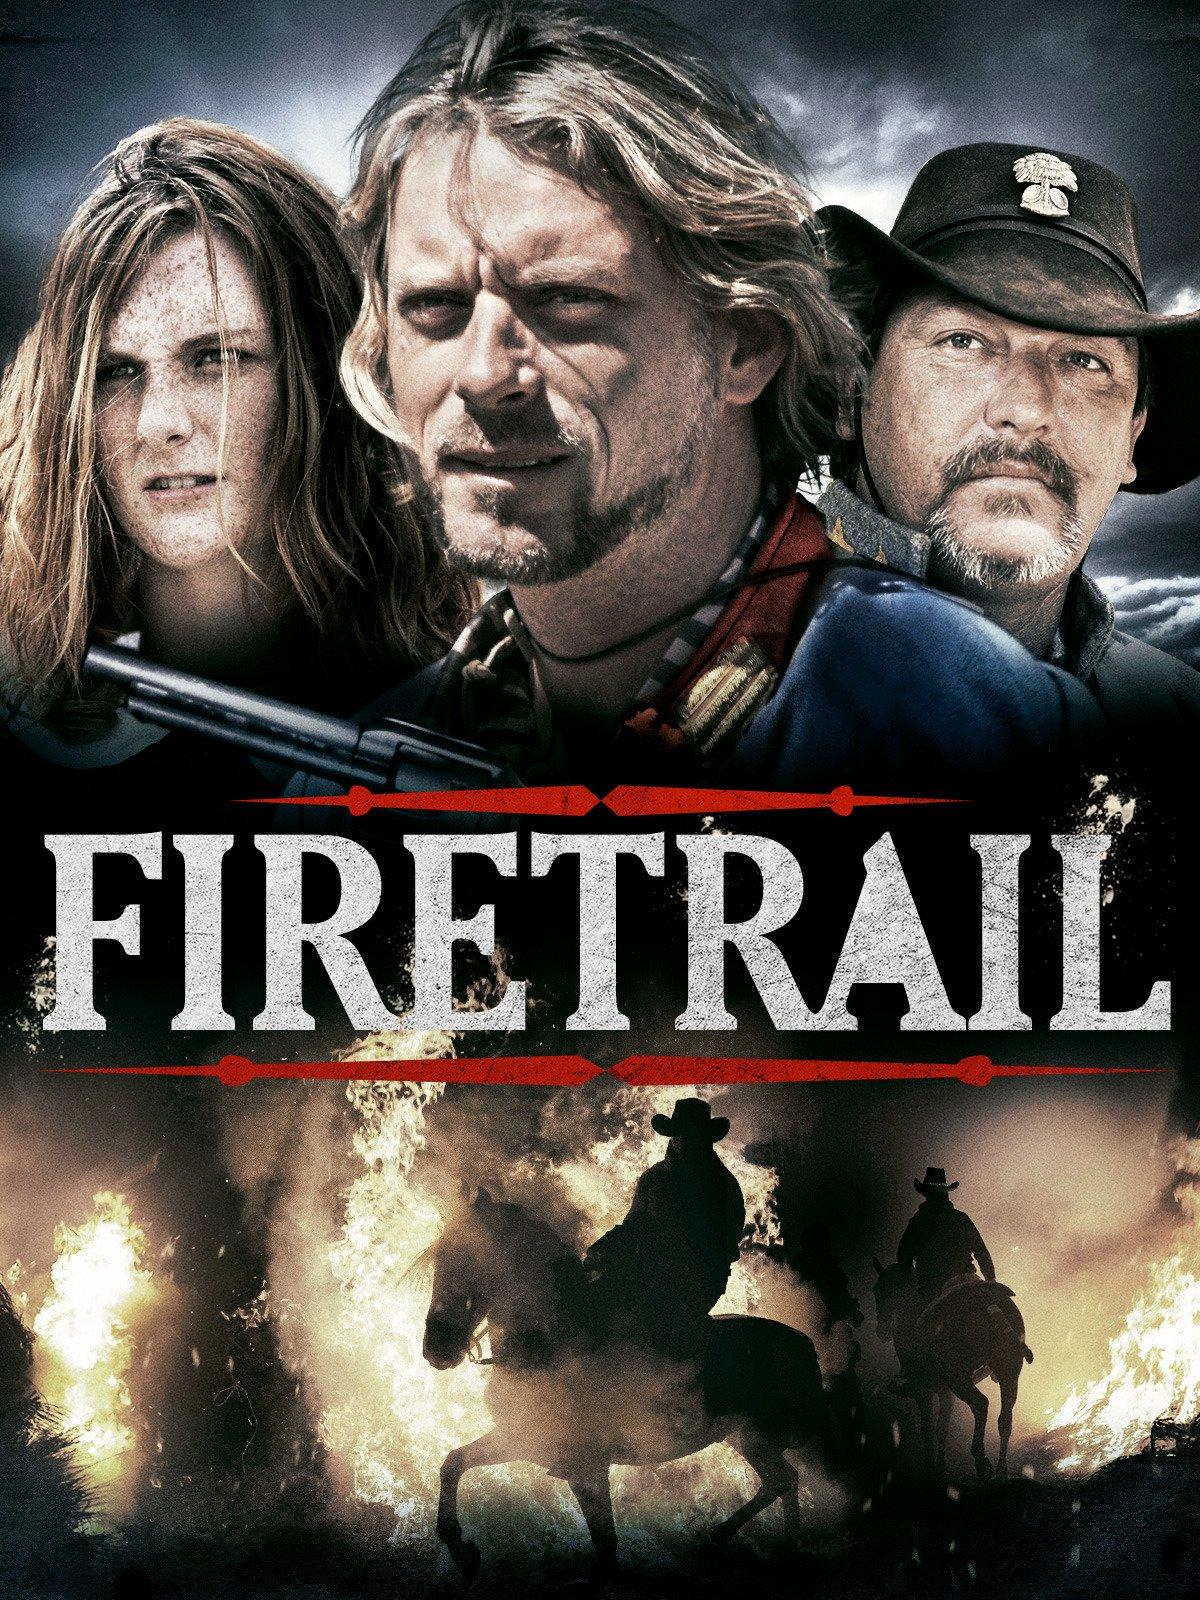 Firetrail on Amazon Prime Instant Video UK